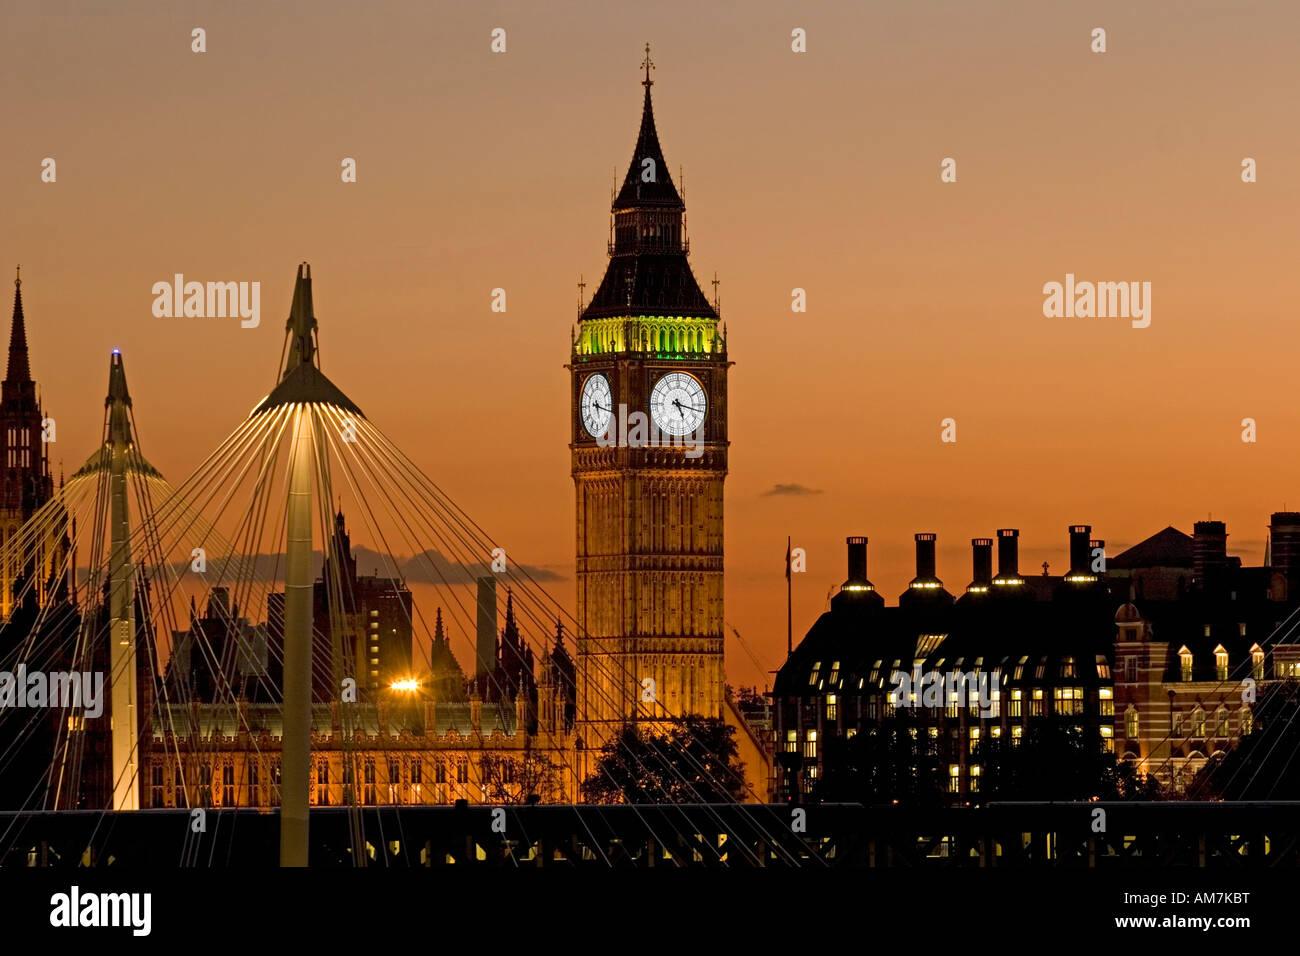 Big Ben at dusk - London - Stock Image